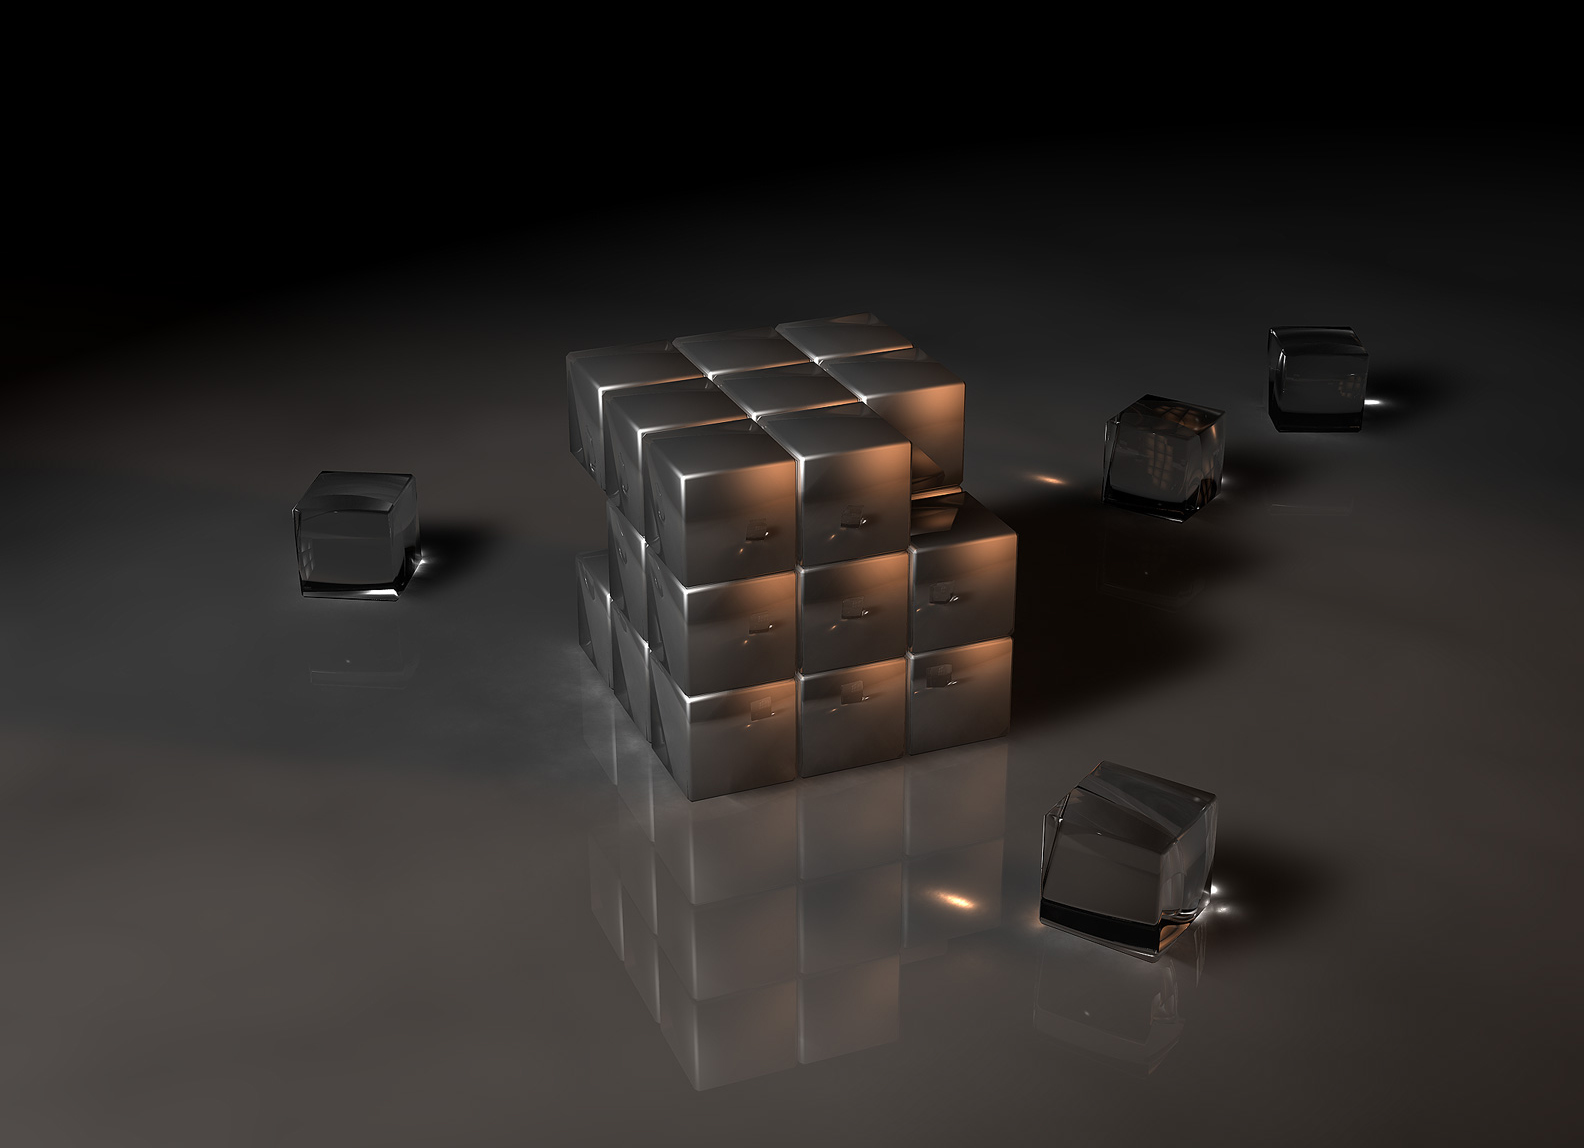 http://1.bp.blogspot.com/-fmtGjqzsKSw/T1-10rwpSvI/AAAAAAAAAfU/Jfsg5ApB_gk/s1600/ipad%2Banimated%2Bwallpapers.jpeg